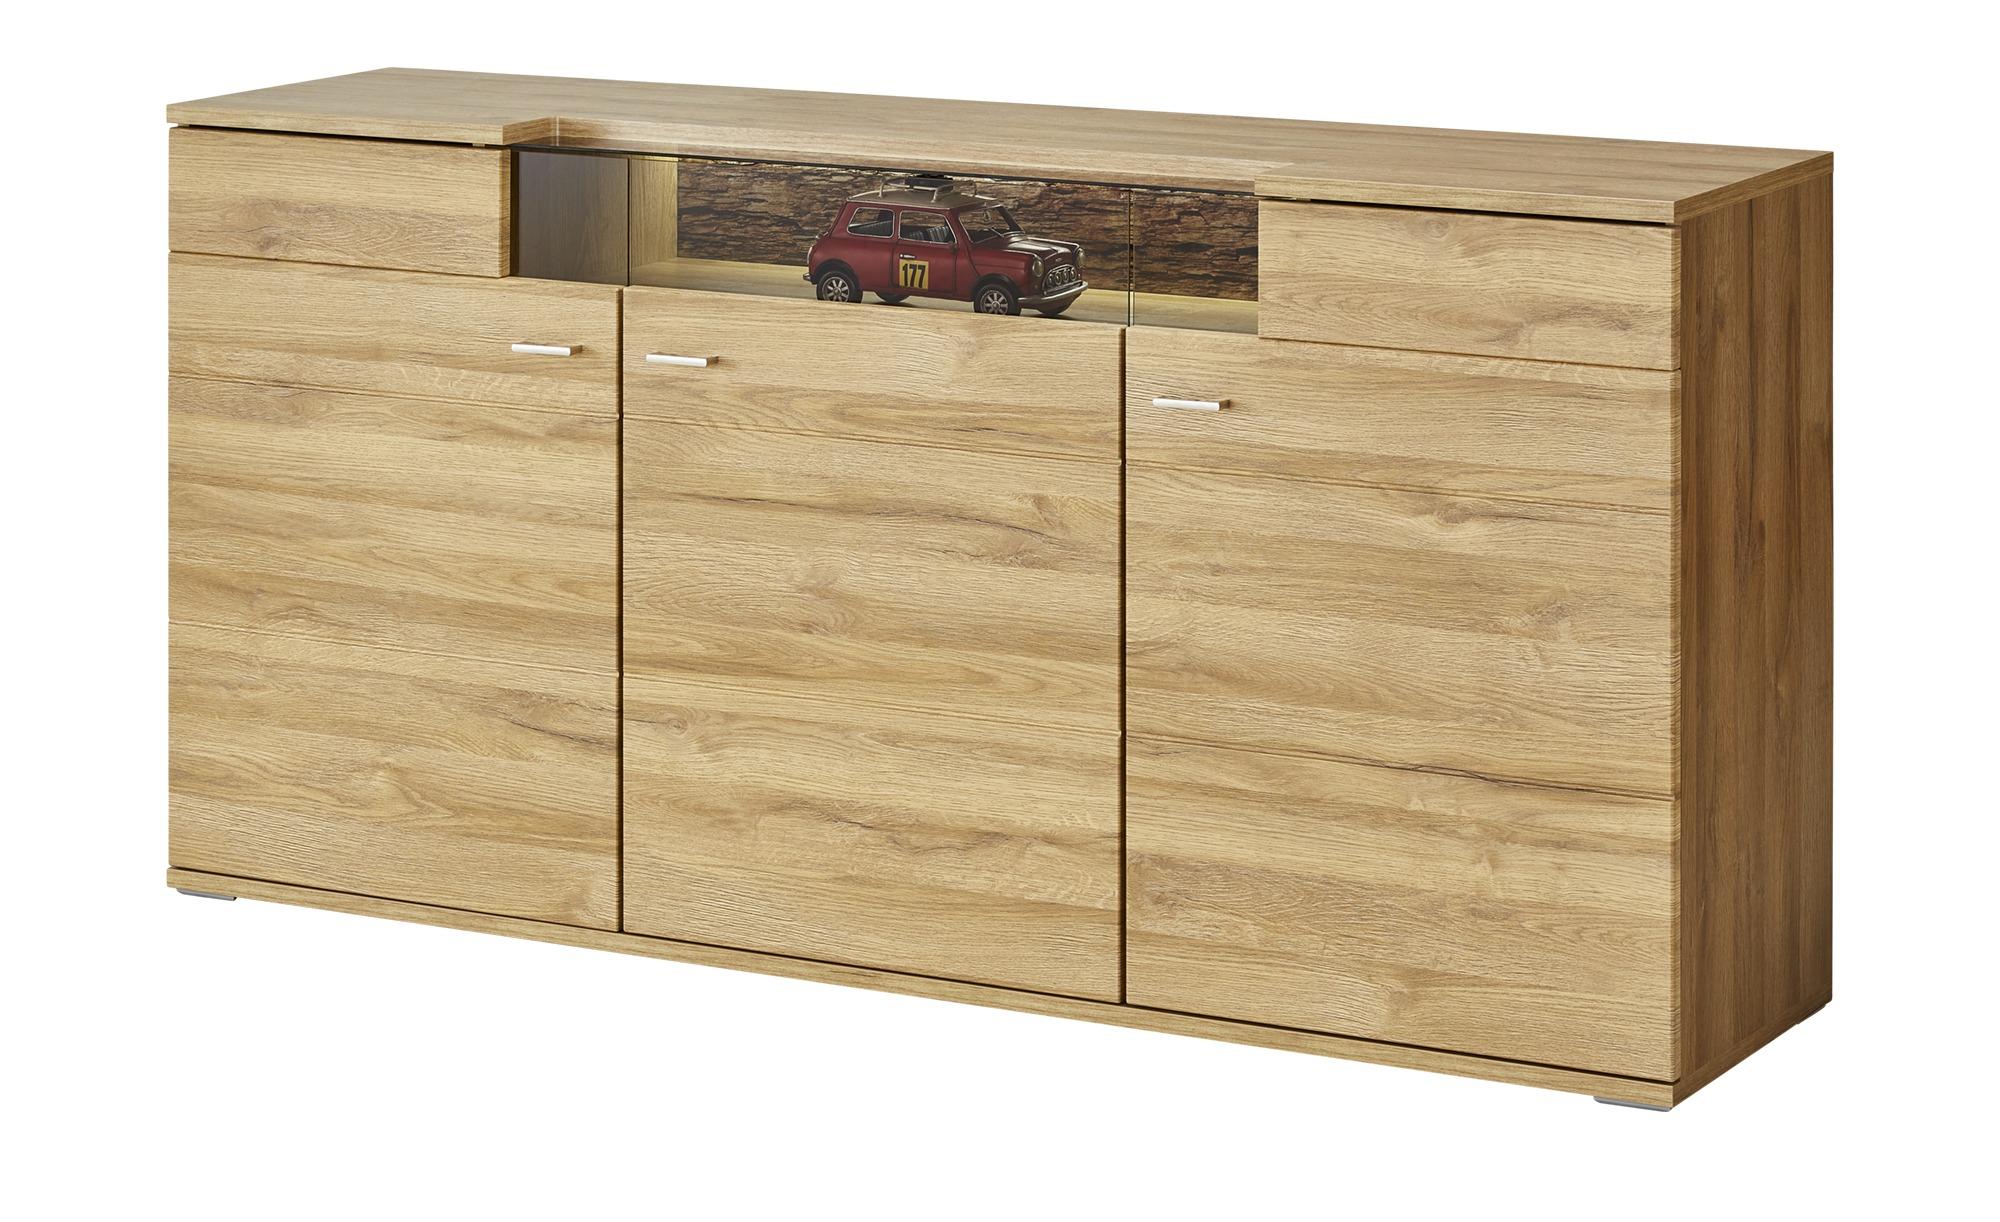 uno Sideboard   Kait ¦ holzfarben ¦ Maße (cm): B: 181 H: 92 T: 44 Kommoden & Sideboards > Sideboards - Höffner